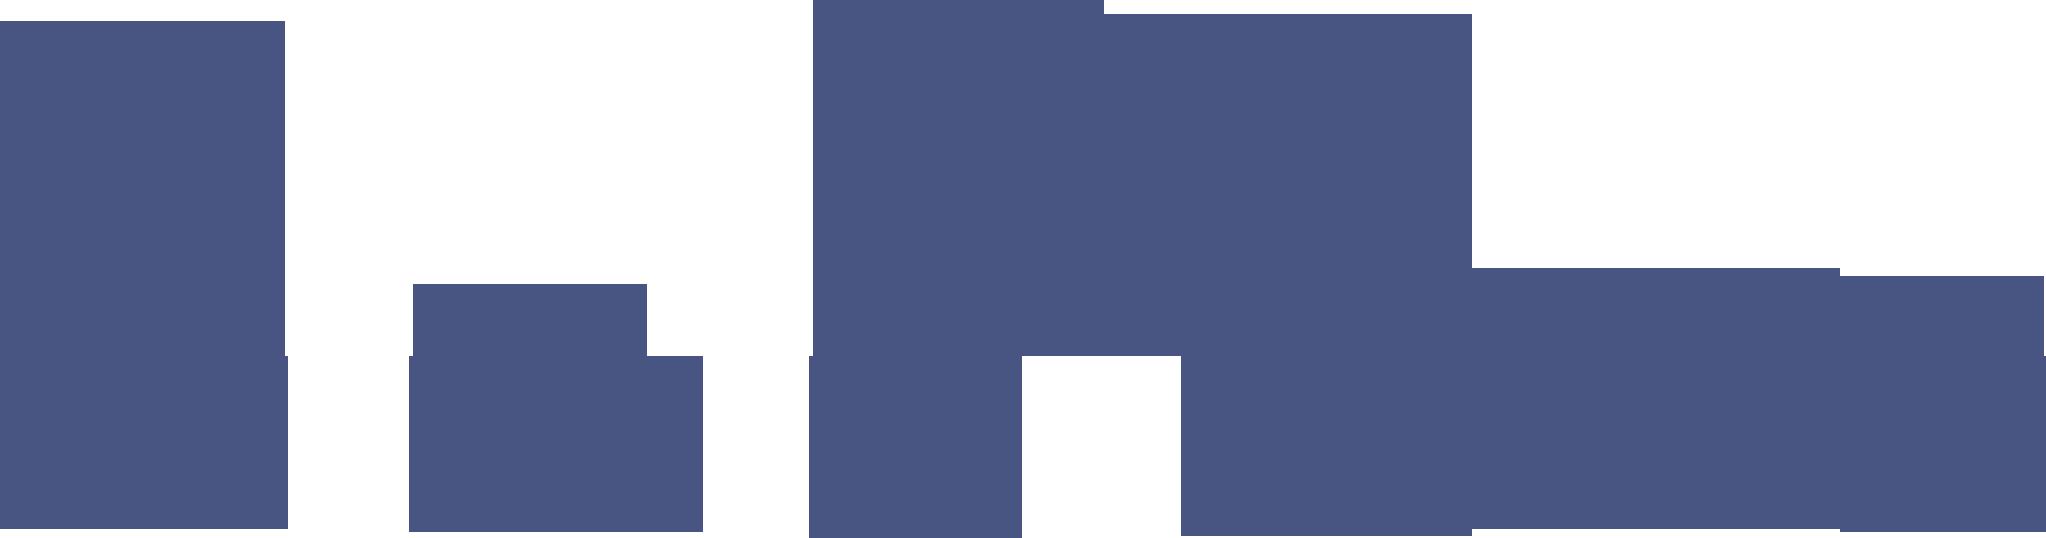 Photogenic_logo